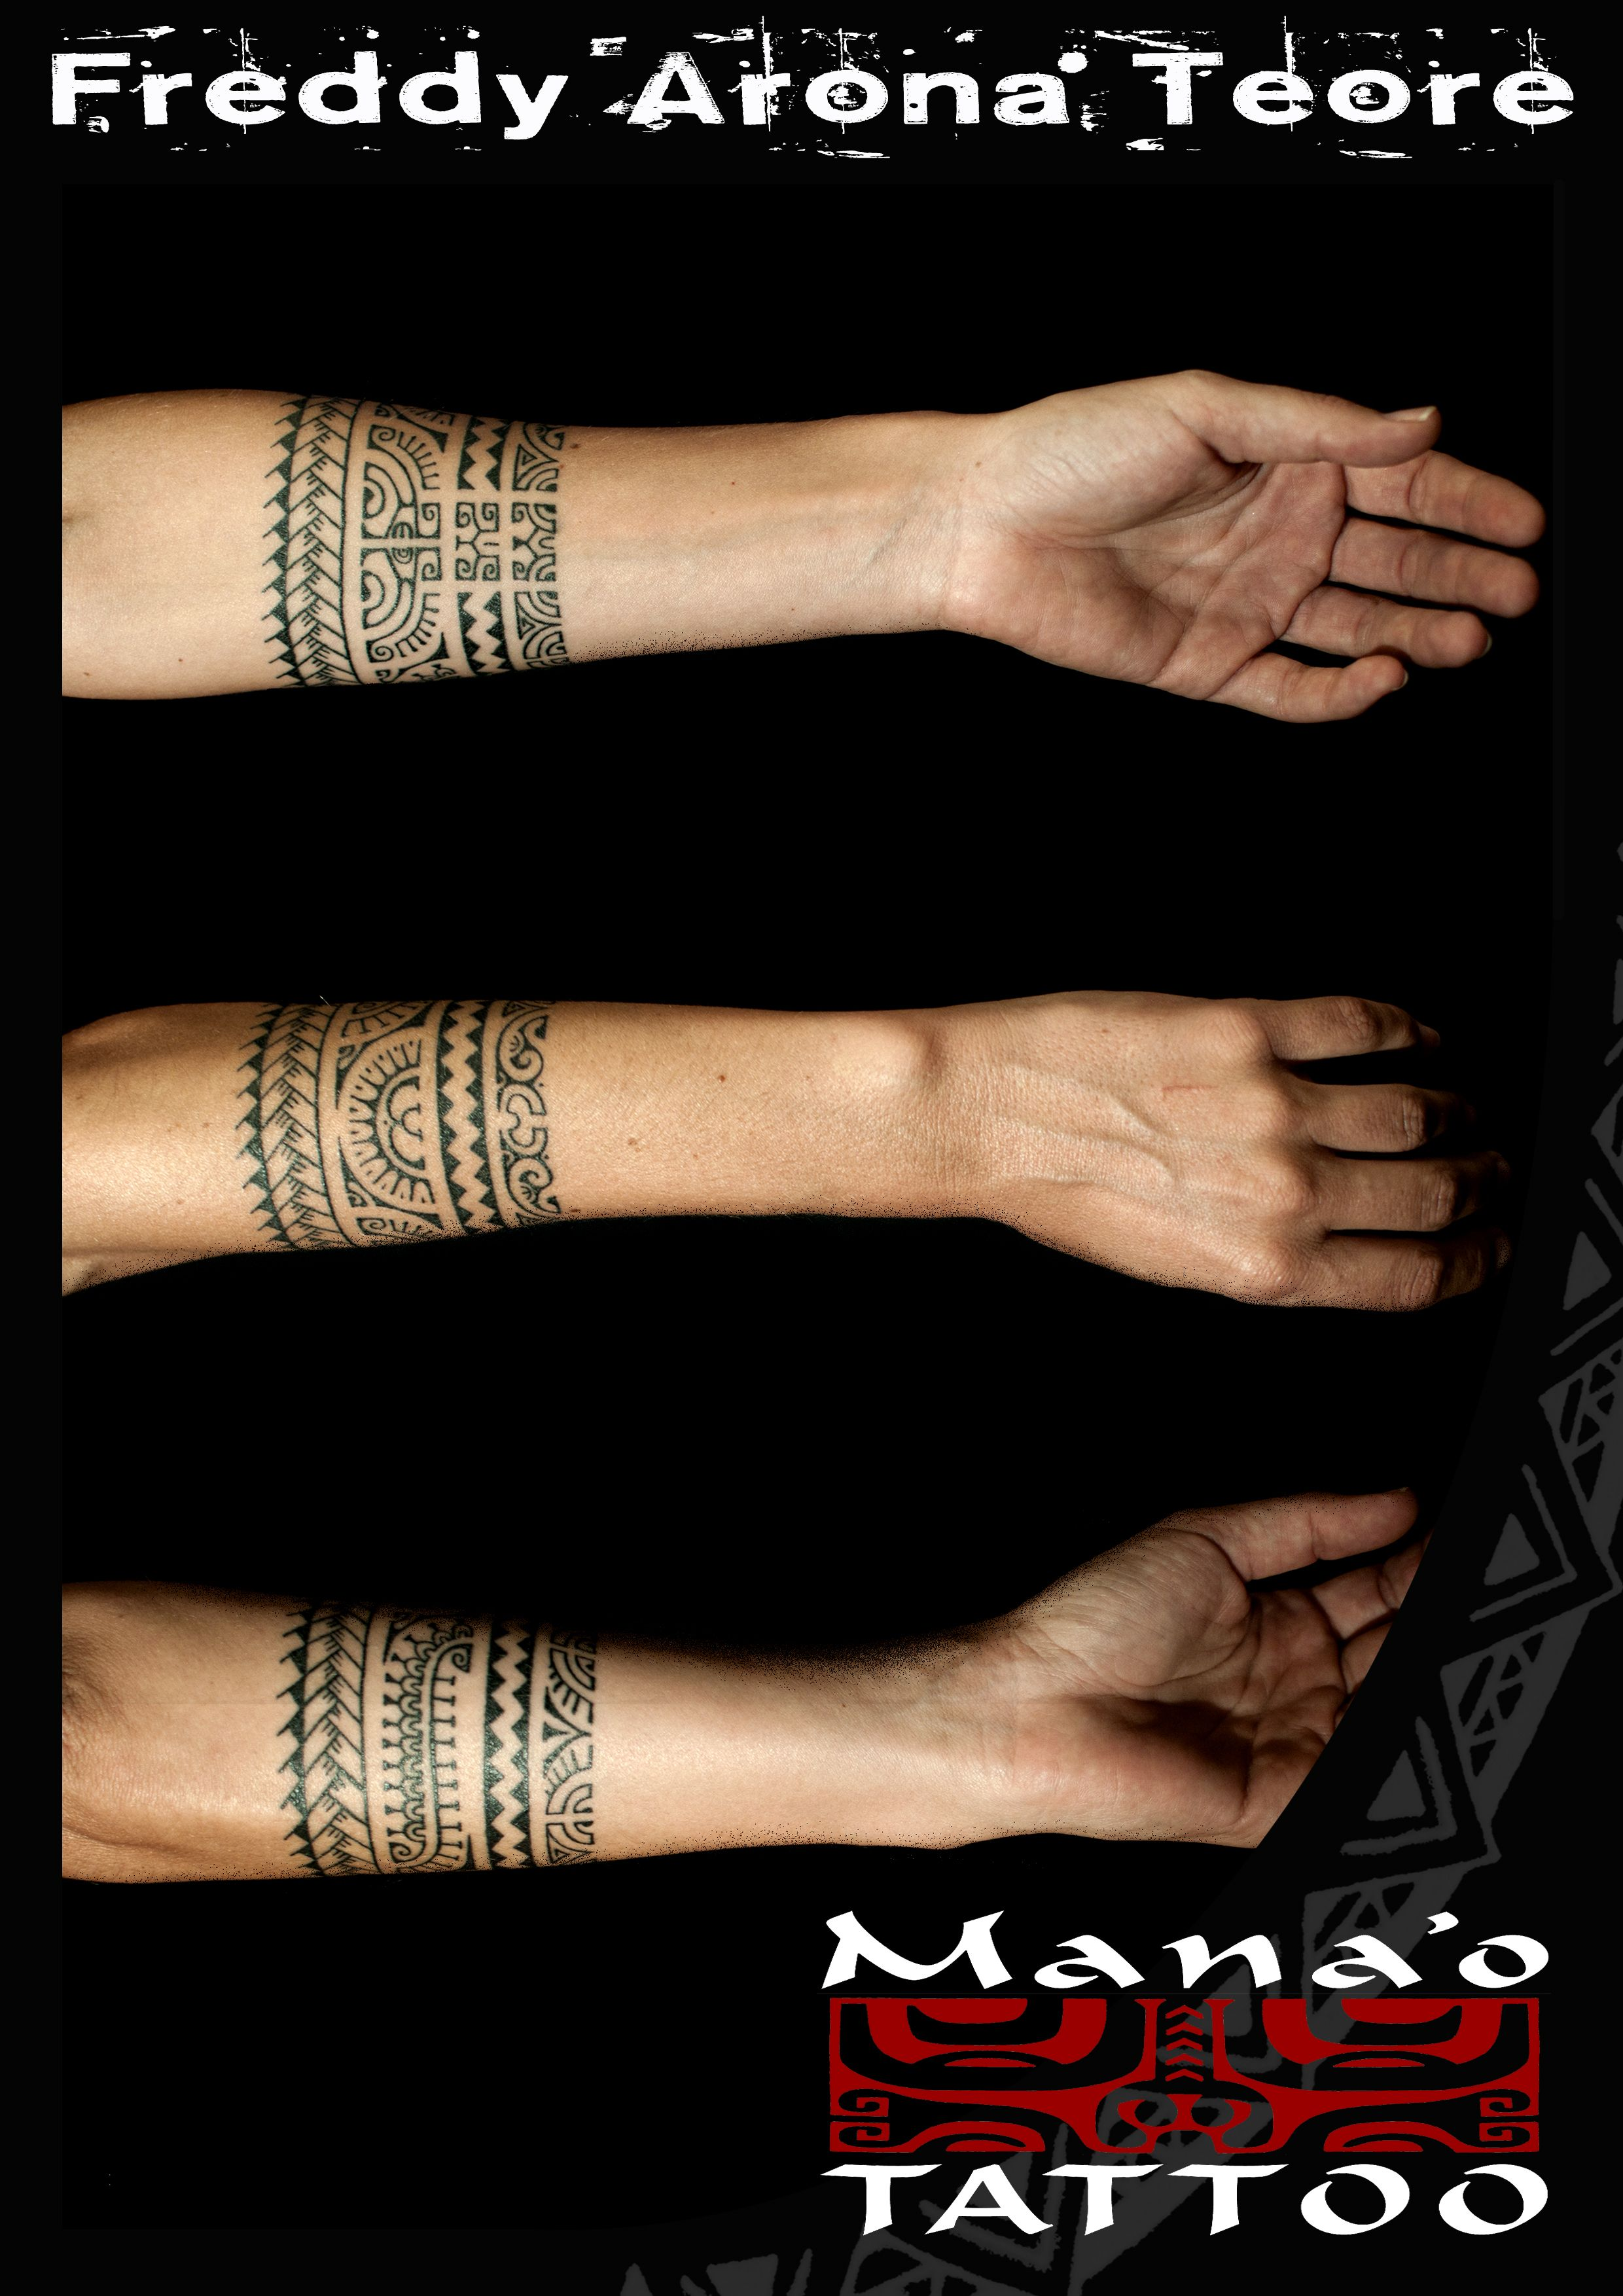 Bracelet Karine Tattoos Tattoos Samoan Tattoo Tattoo Bracelet